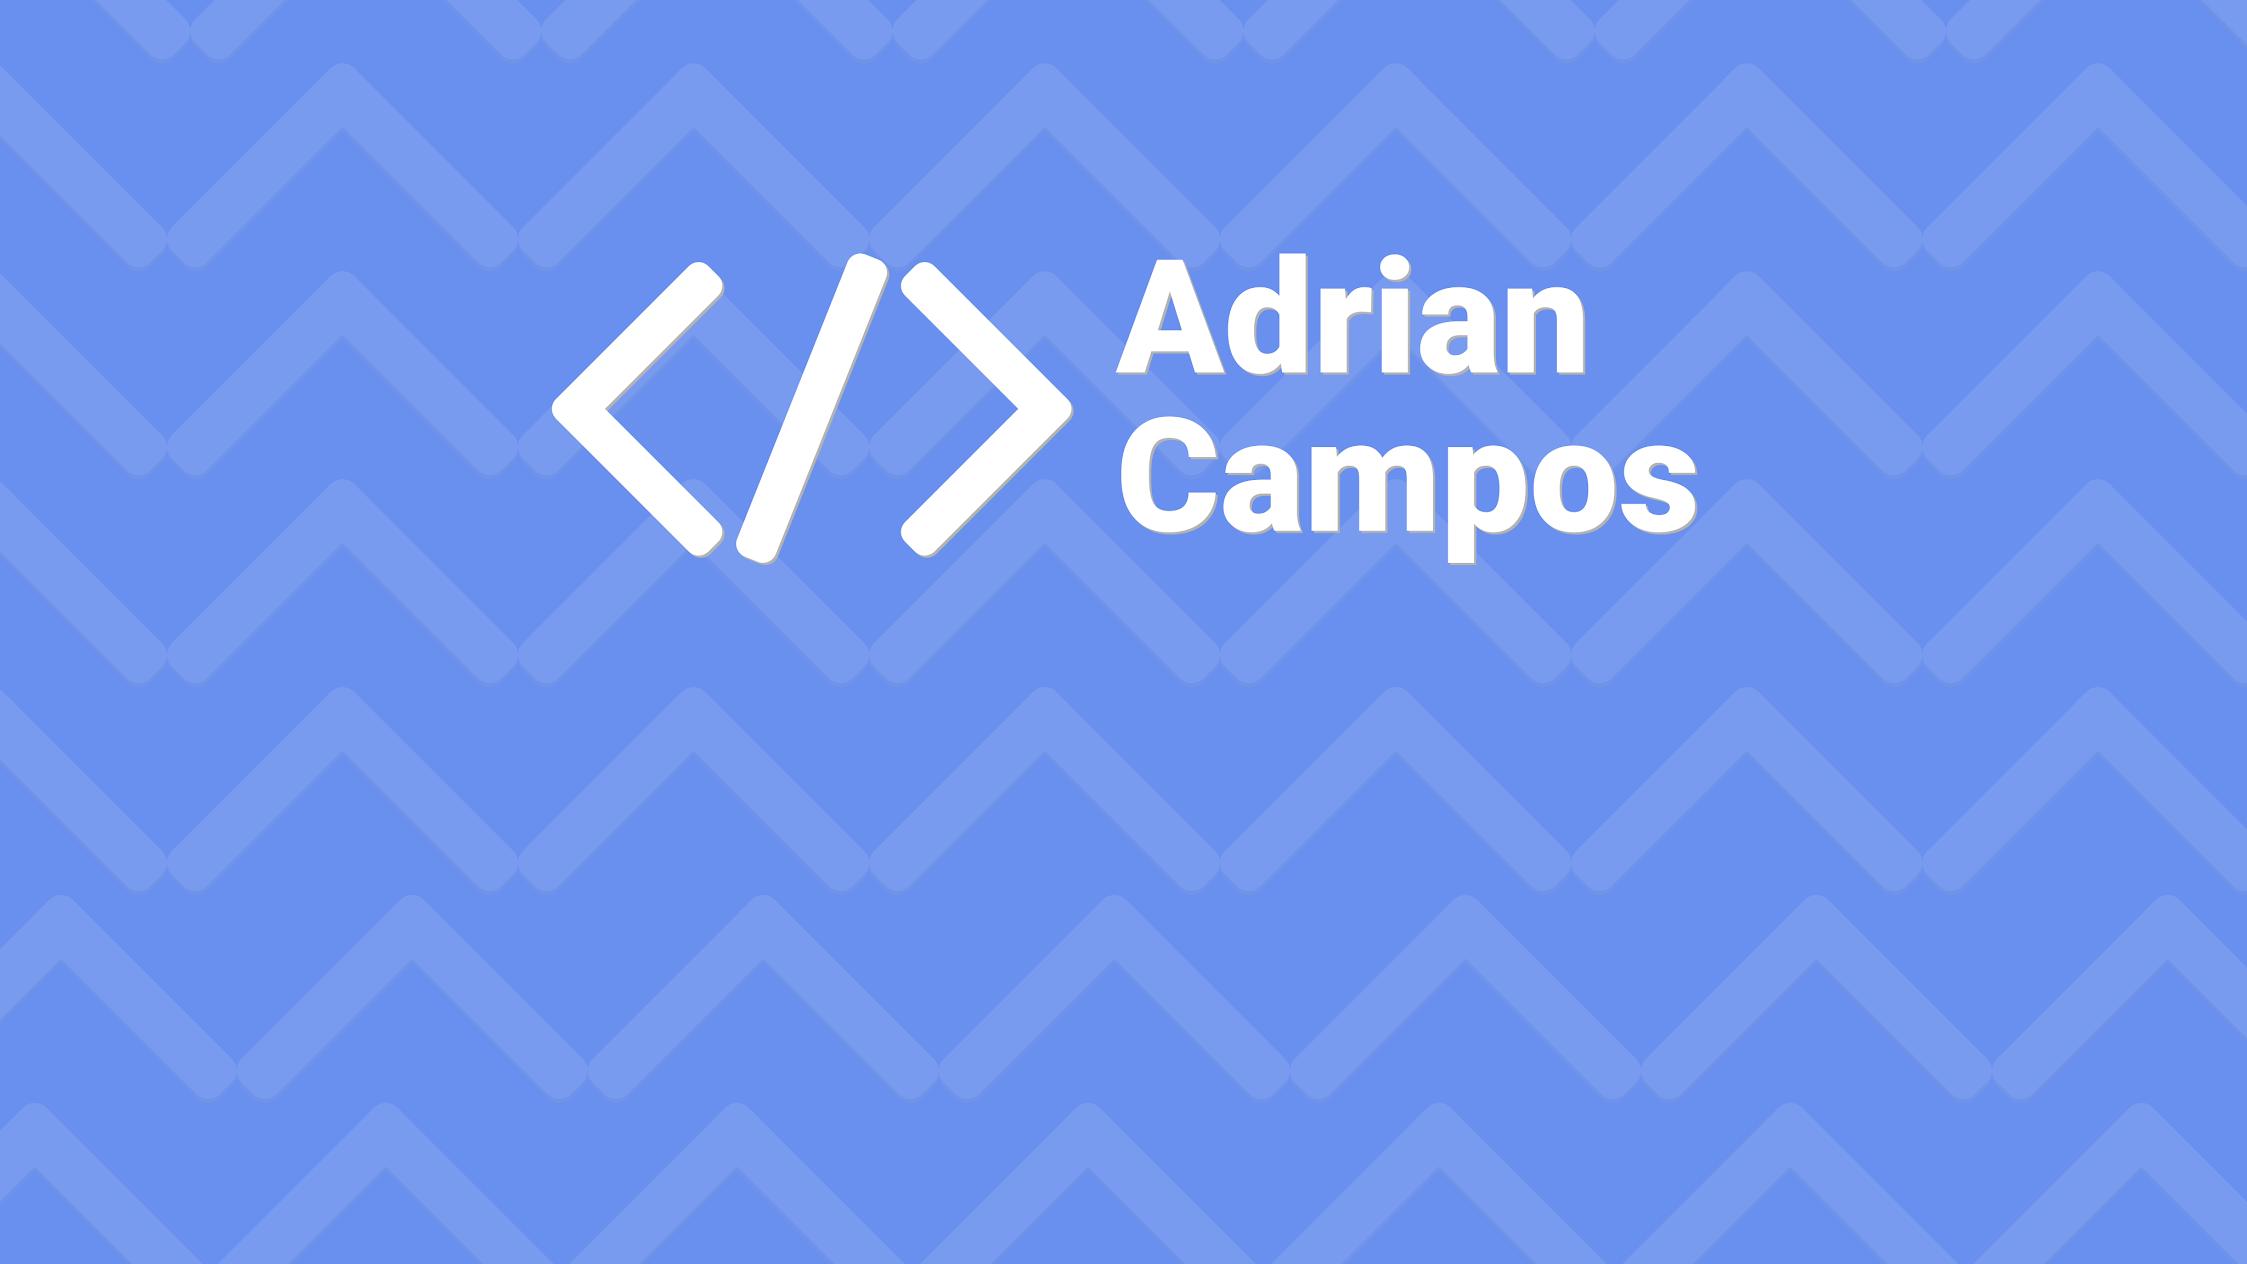 Adrian Campos